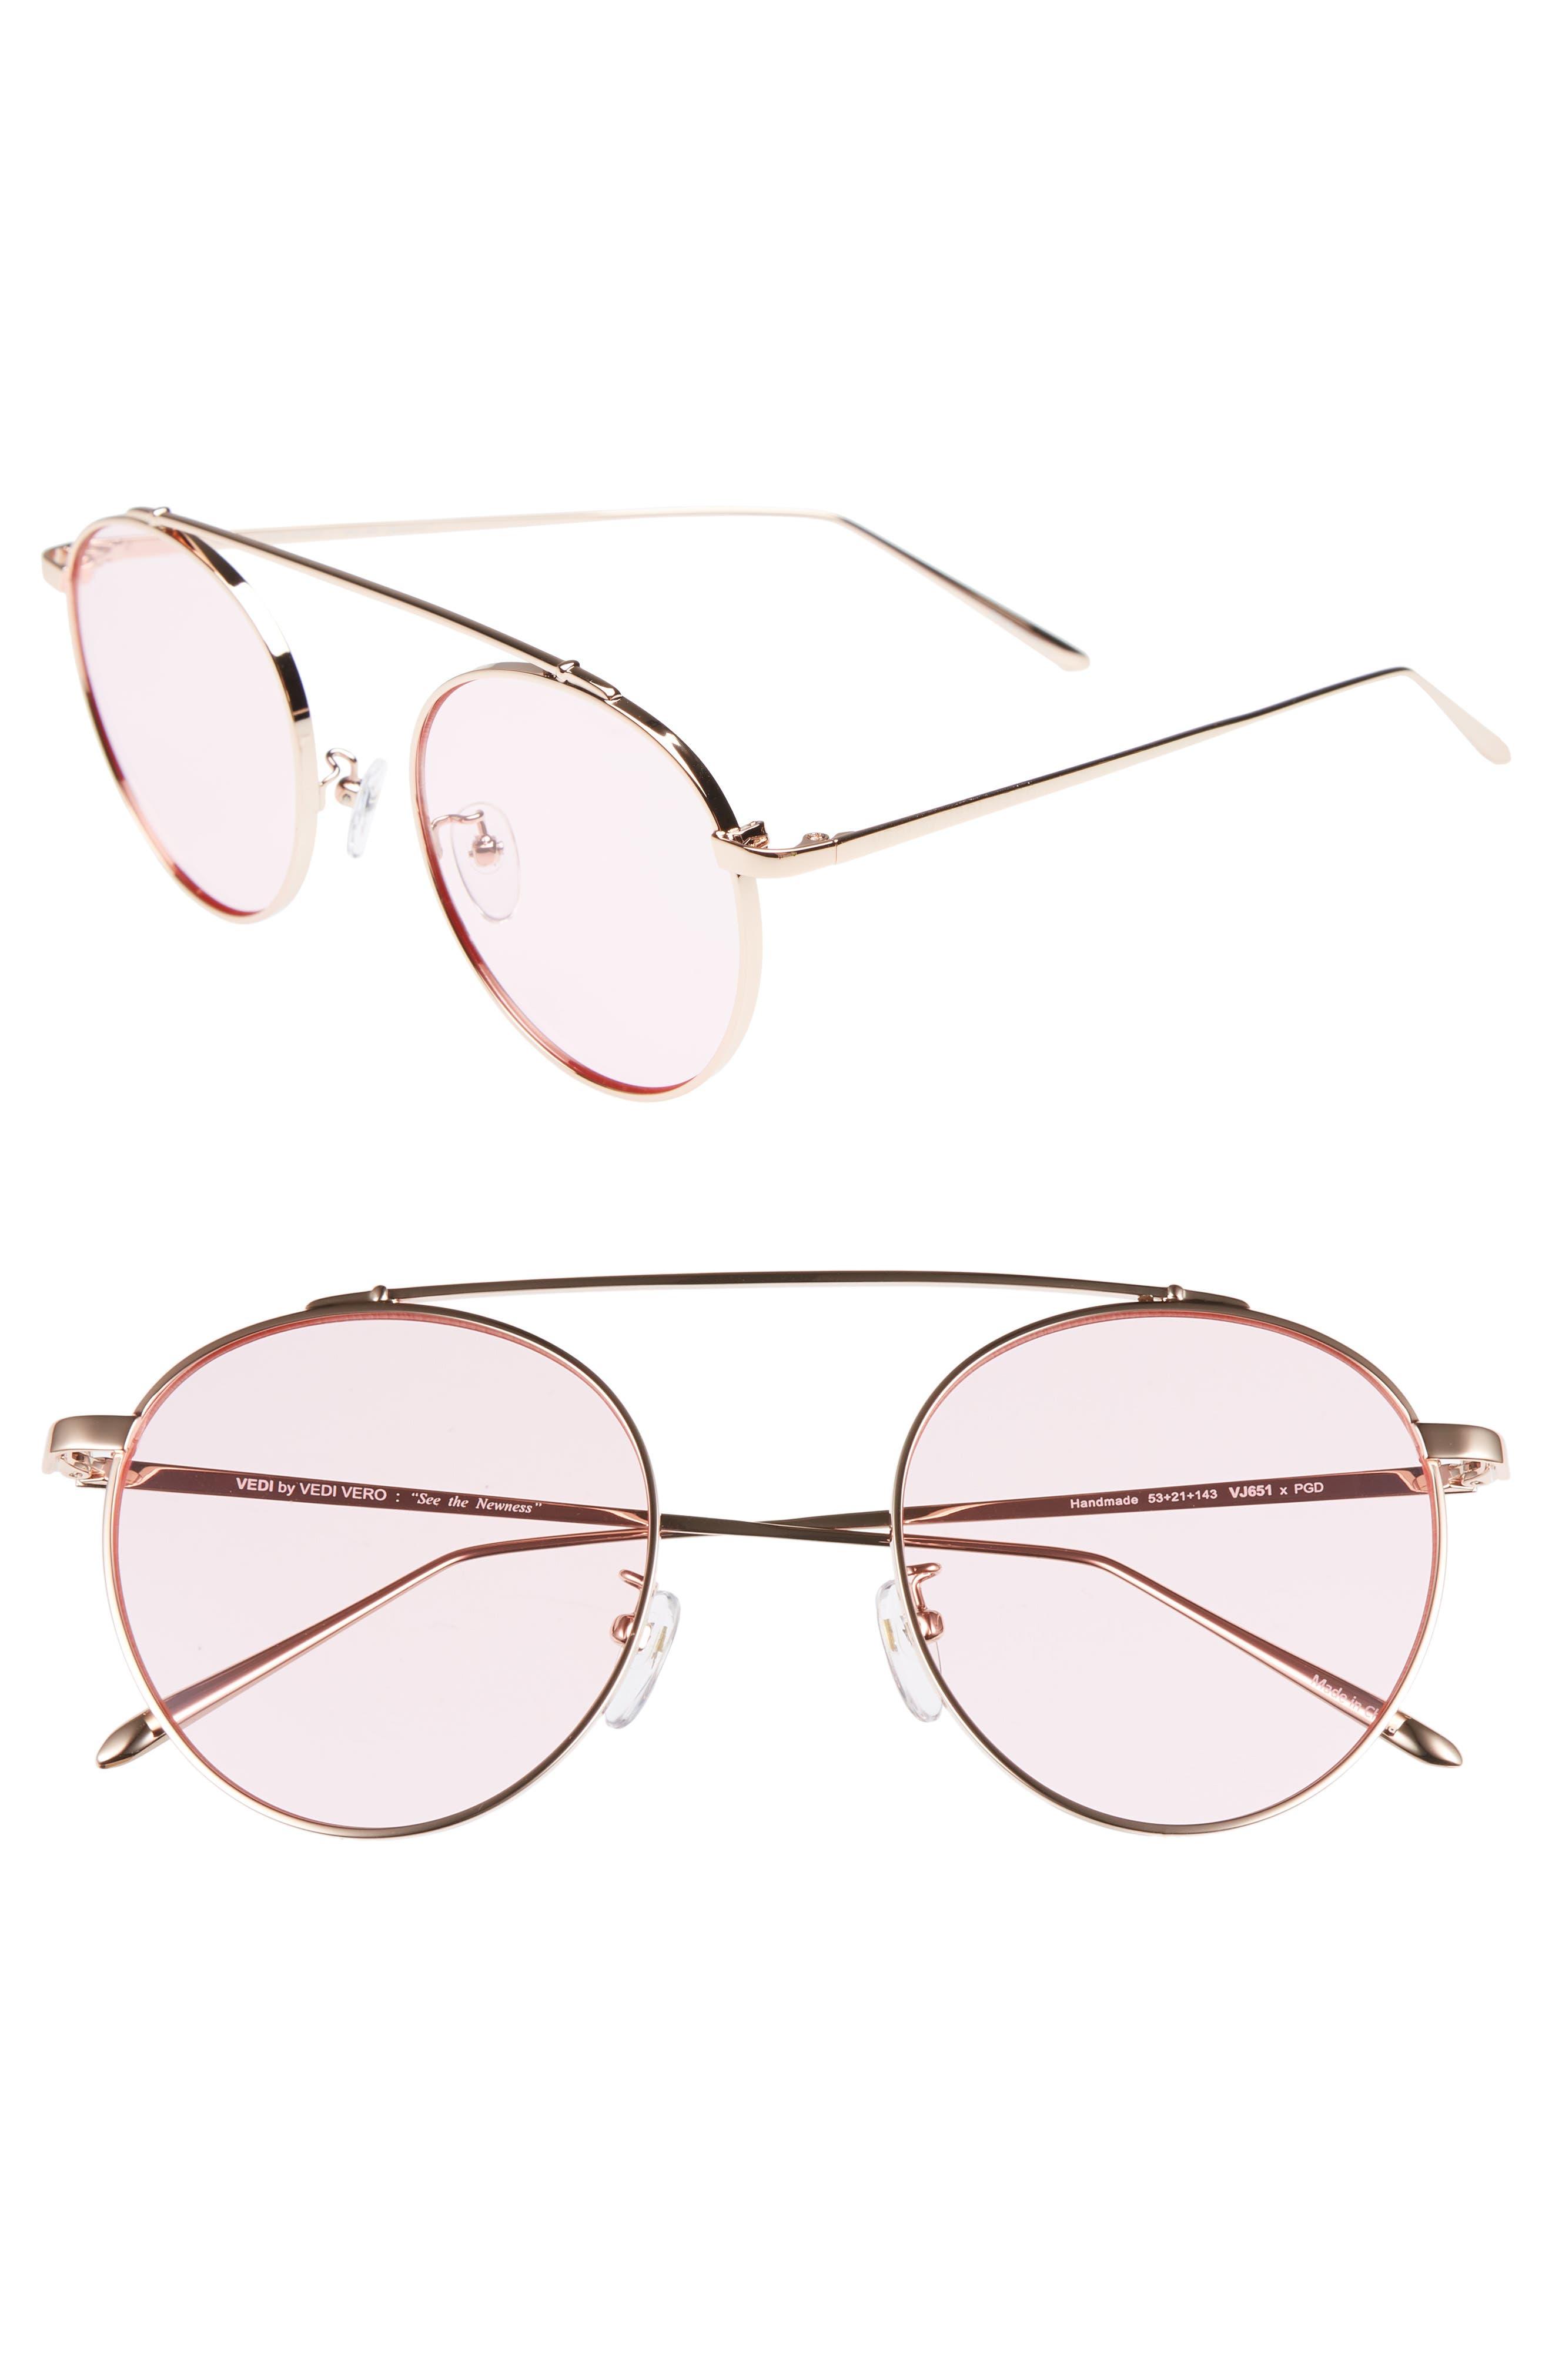 53mm Round Sunglasses,                             Main thumbnail 1, color,                             Rosegld/Pink